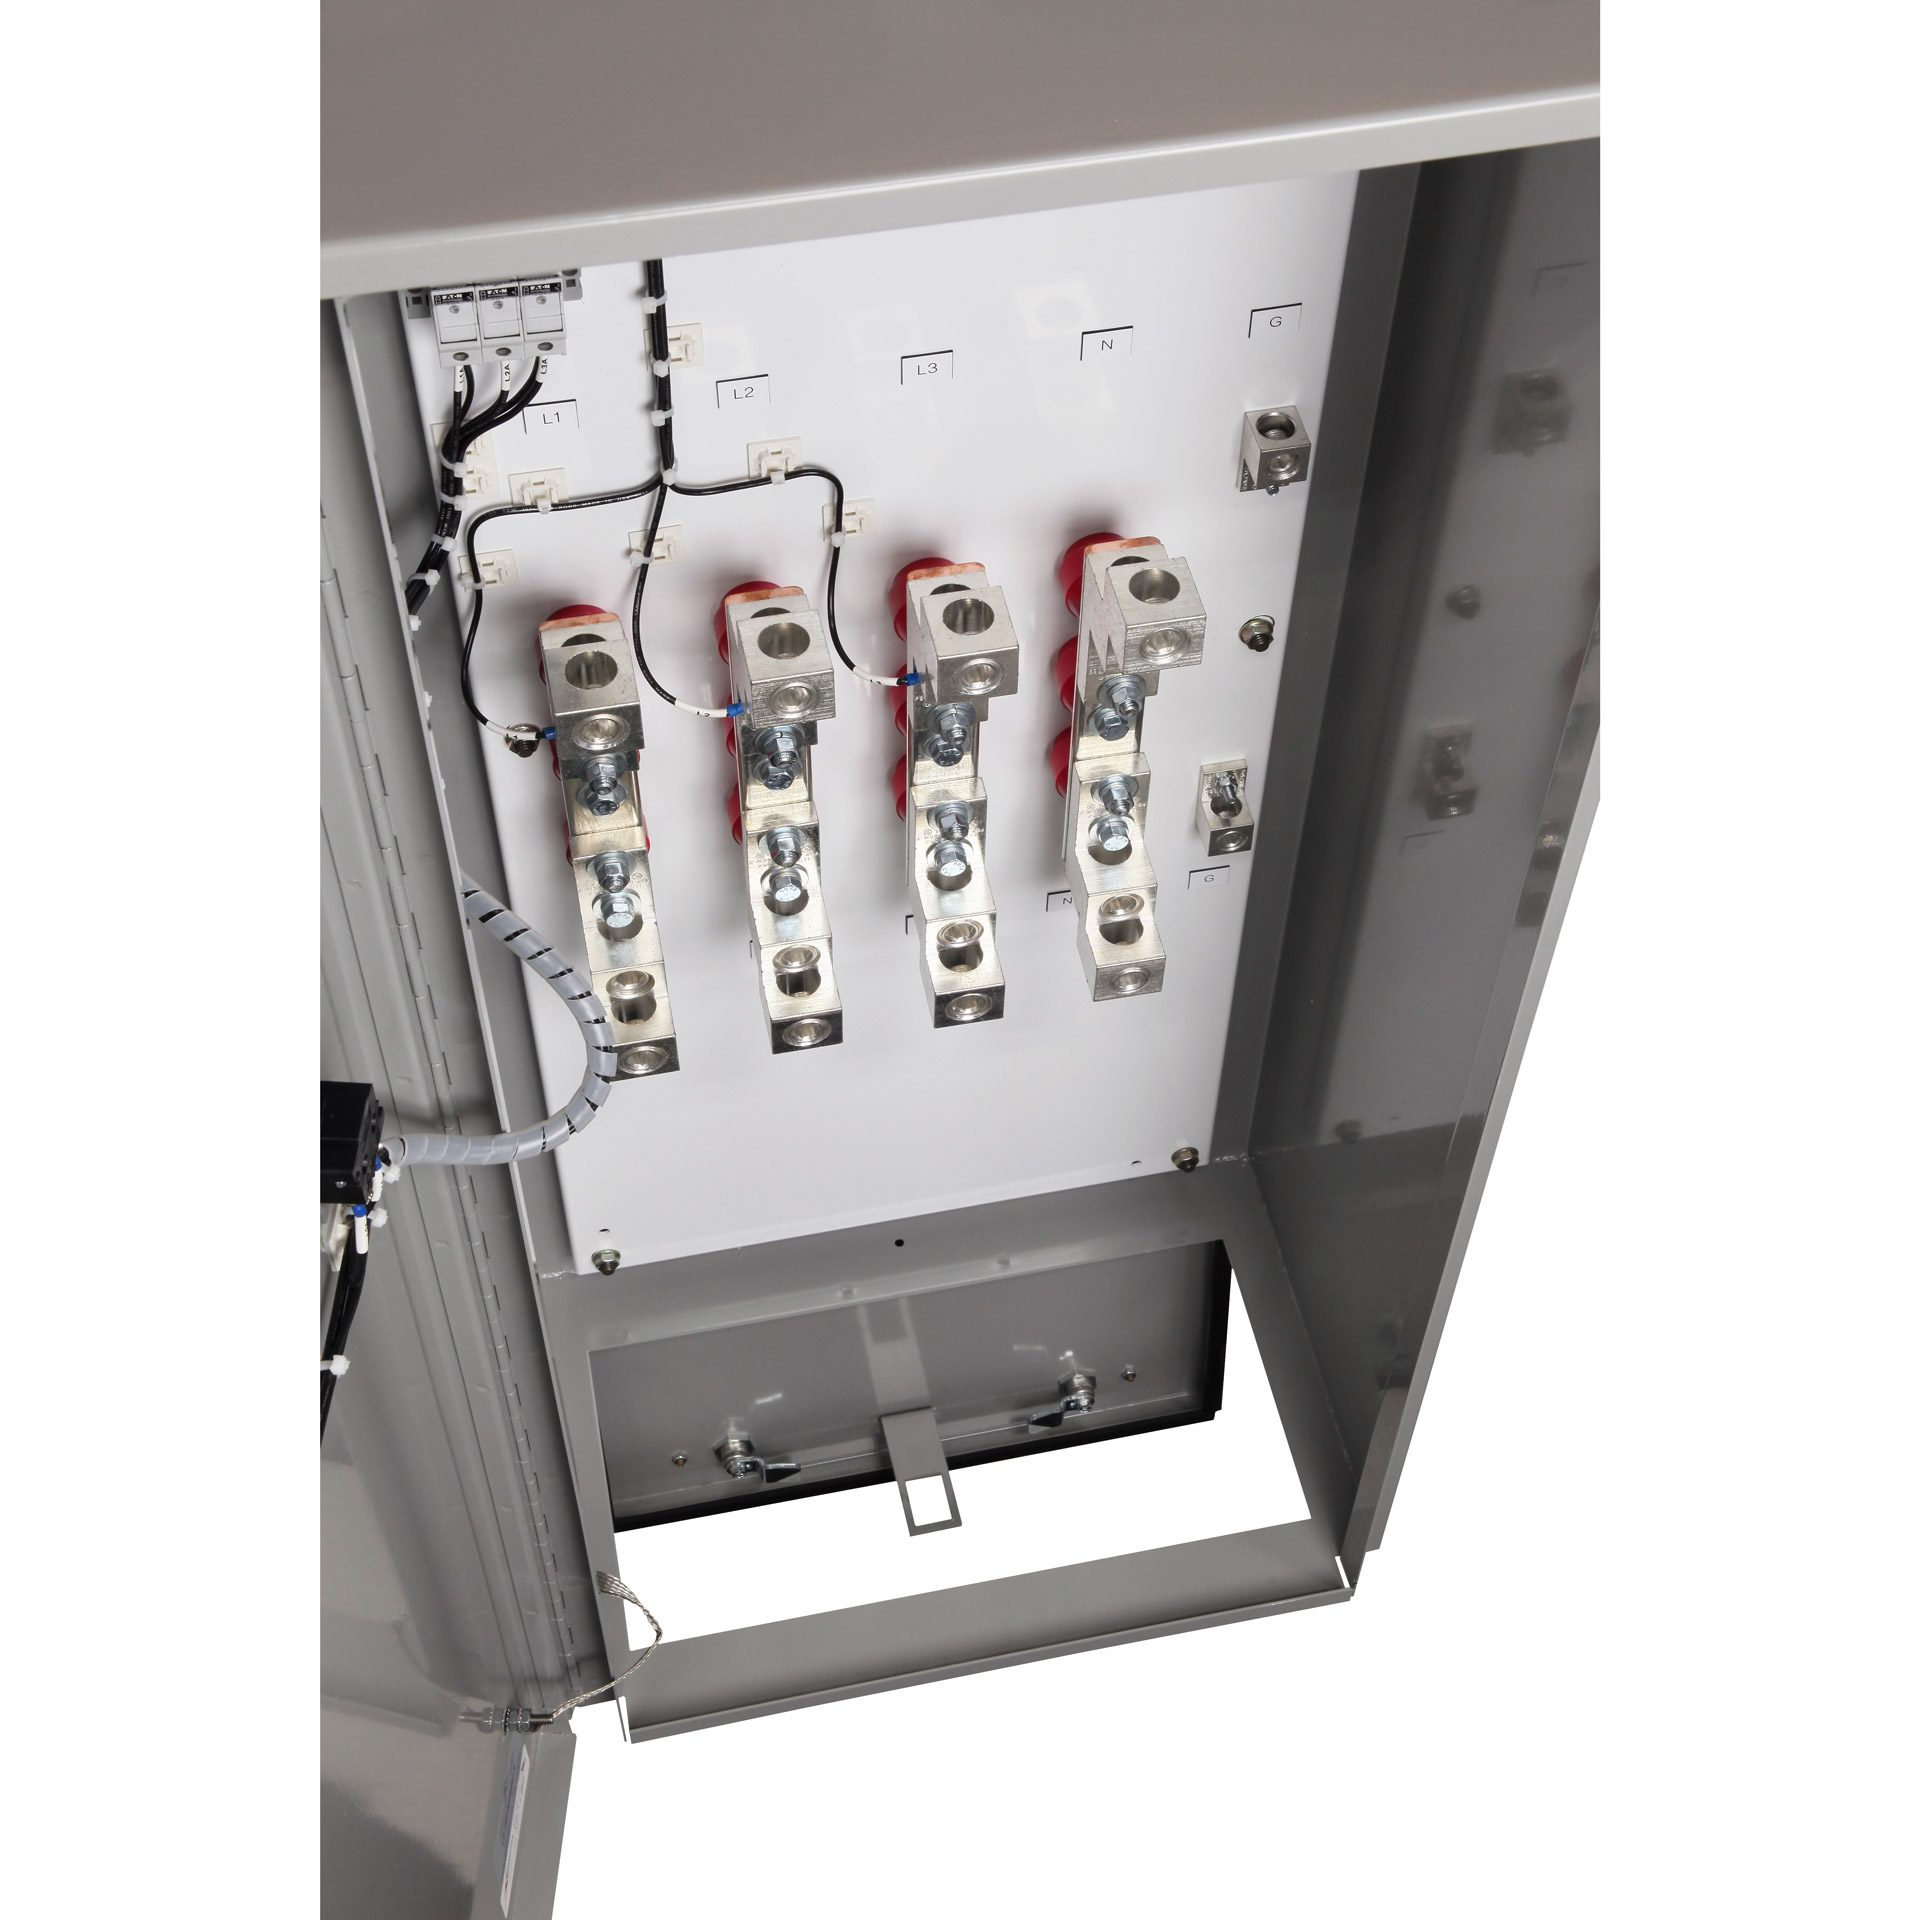 200 Amp Main Breaker Wiring Diagram Wiring Diagram Photos For Help